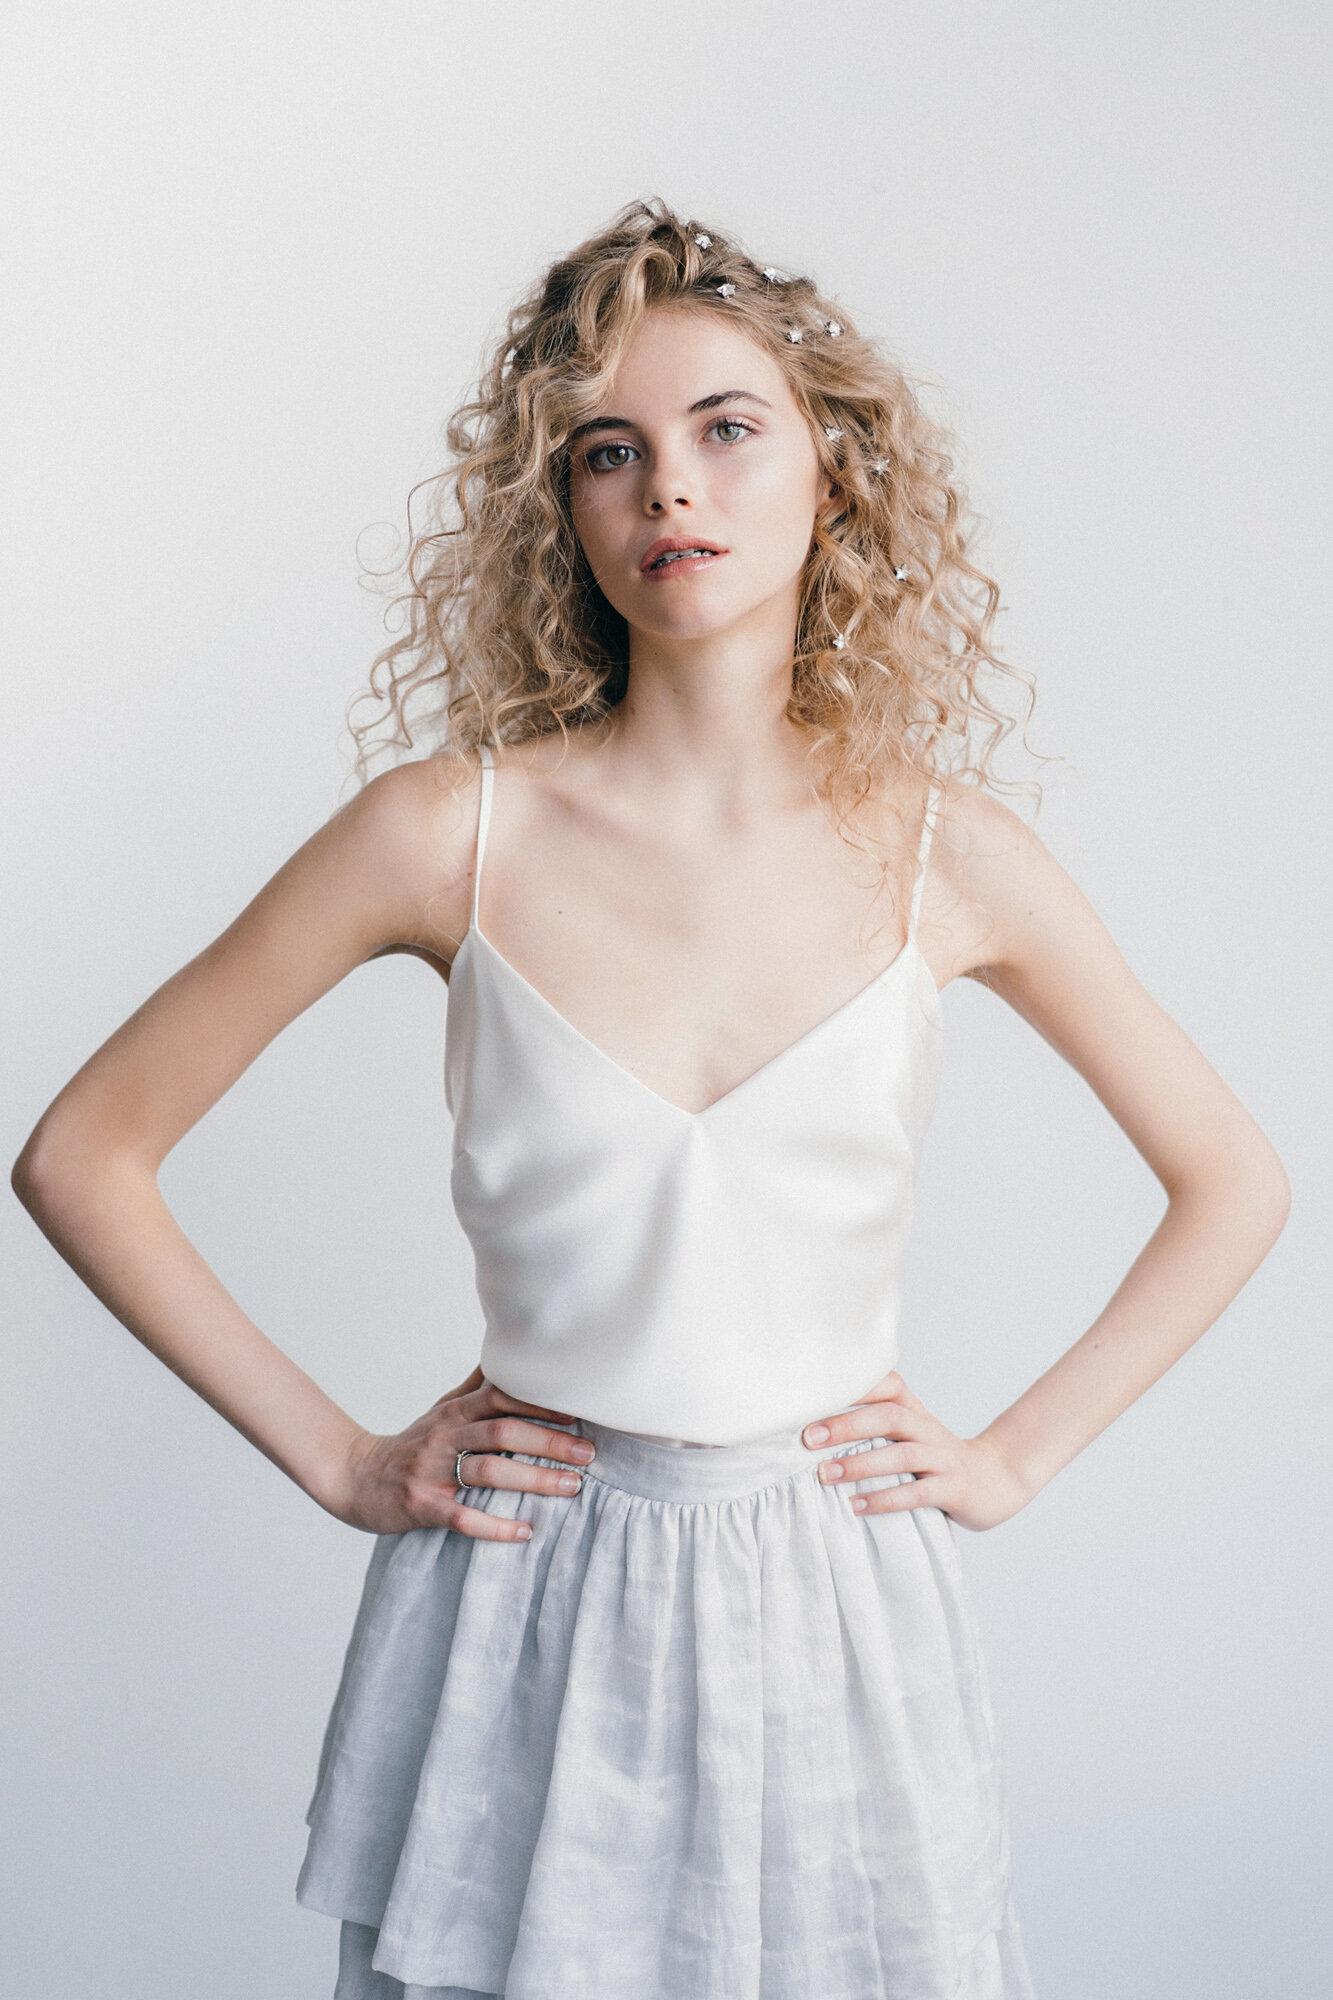 Debbie-Carlisle-Bridal-Accessories-Kate-Beaumont-Wedding-Gowns-Sheffield-Yorkshire-UK-28.jpg